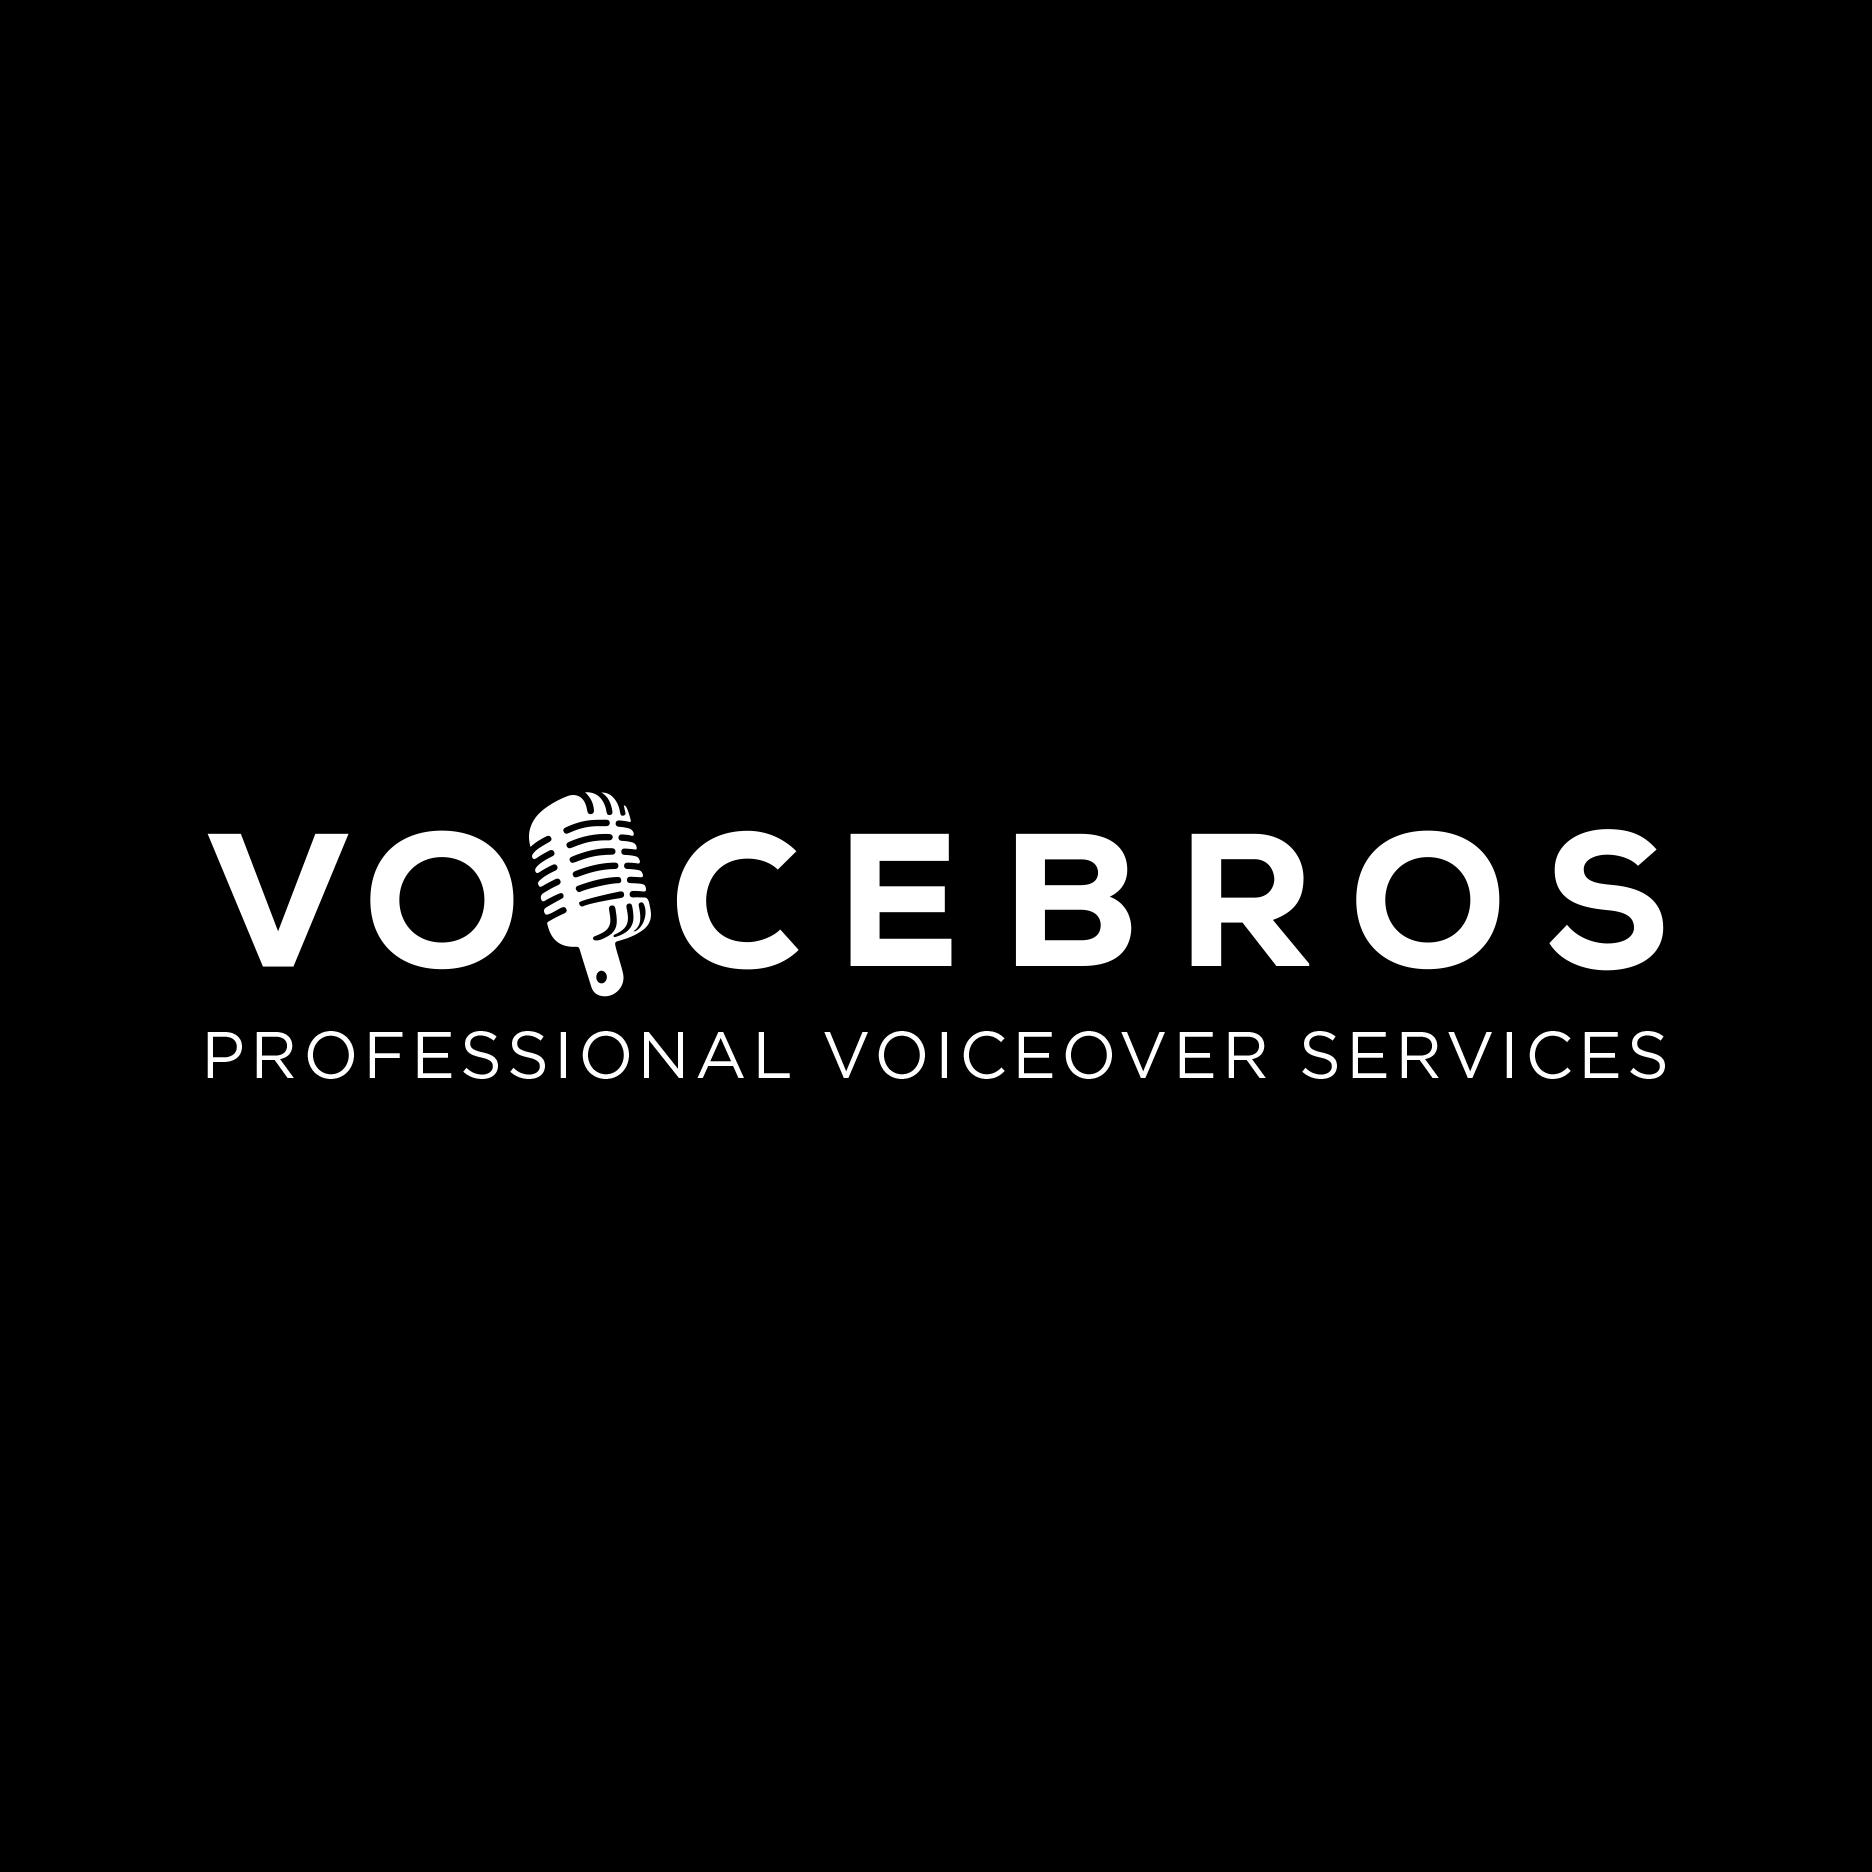 eduard reinoso is a voice over actor